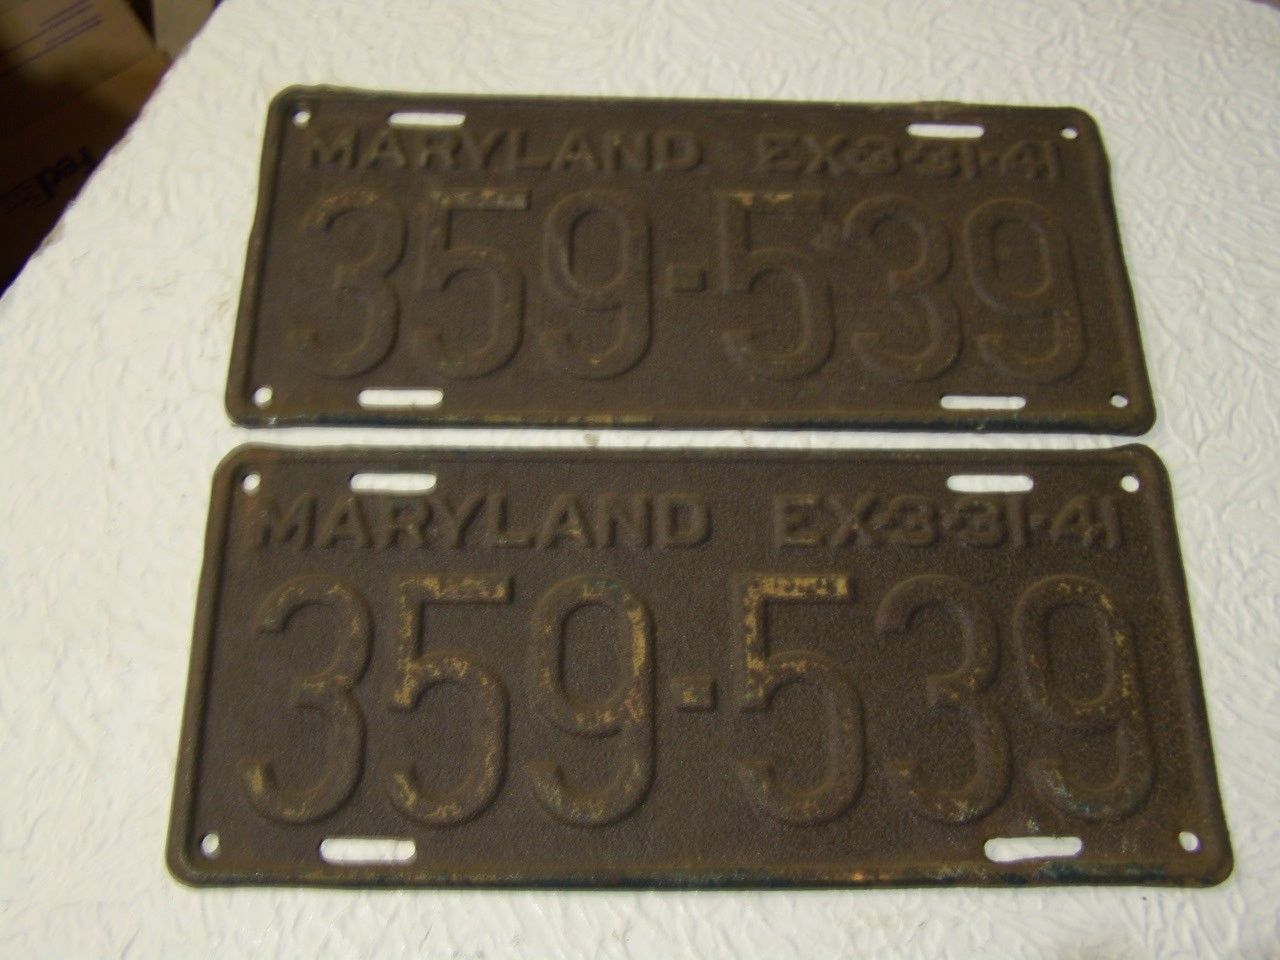 41 MD plates.JPG